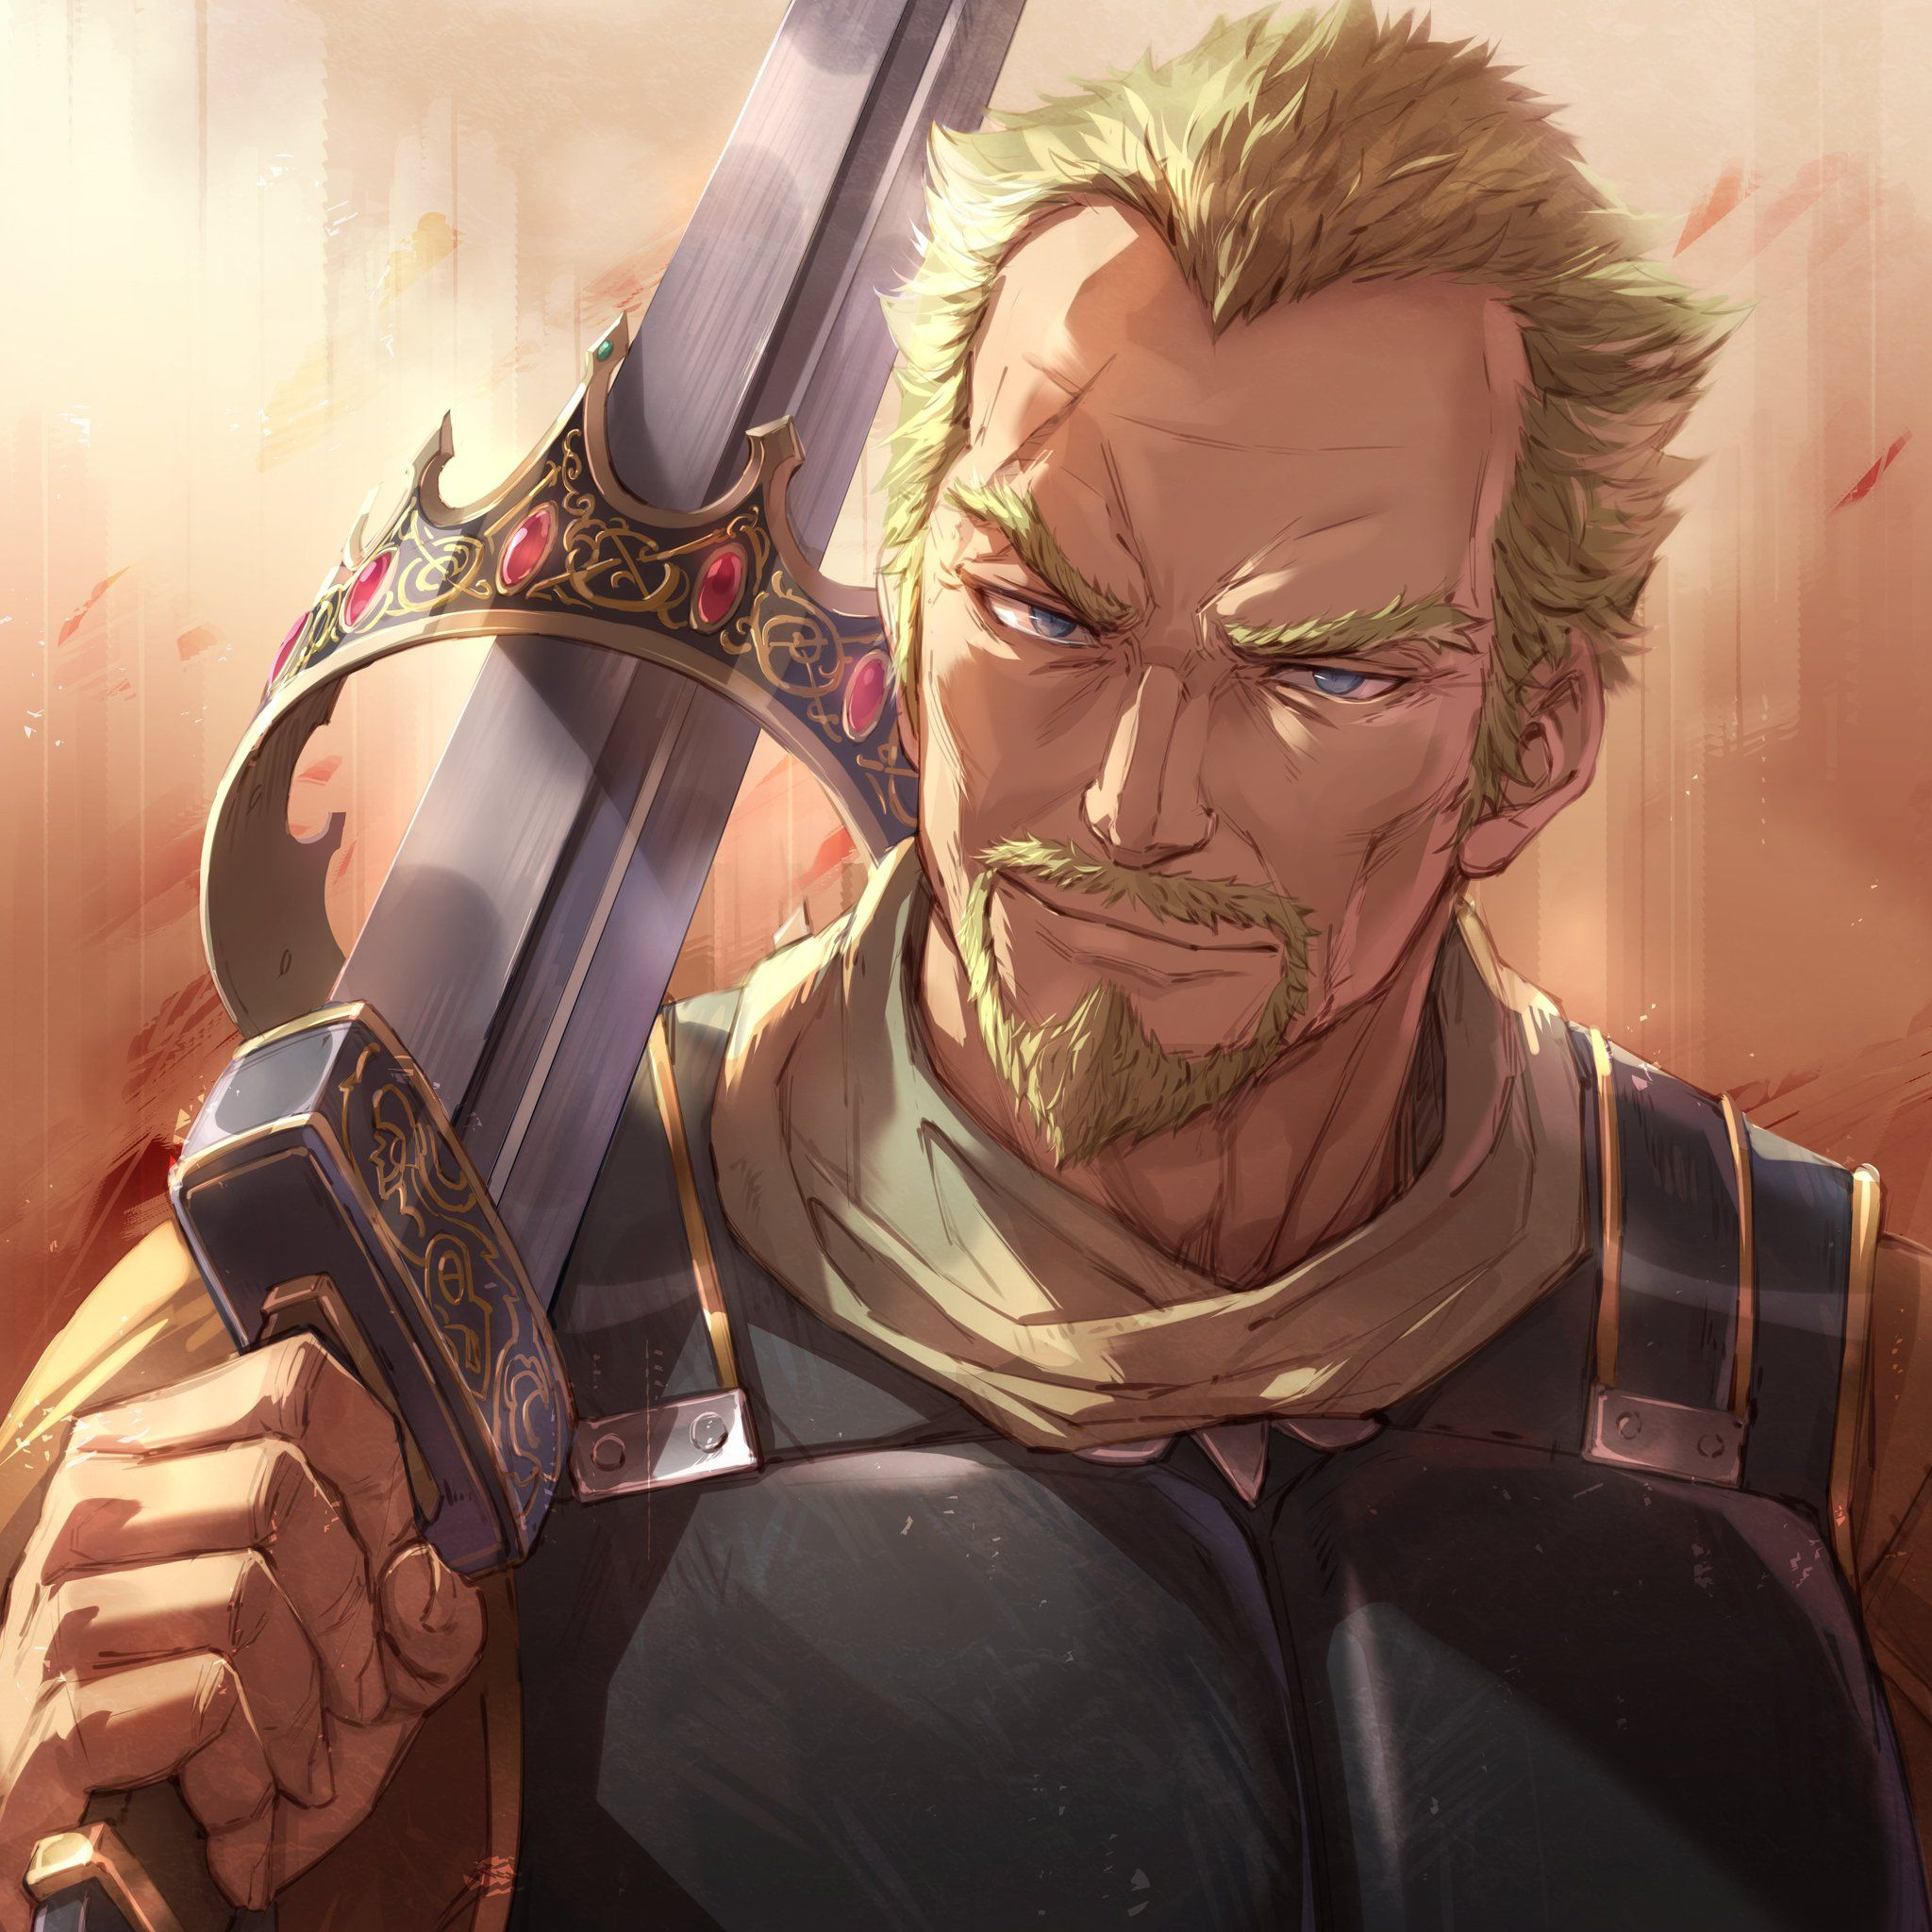 Pin by 6TONE on Anime/Manga in 2020 Saga art, Vinland